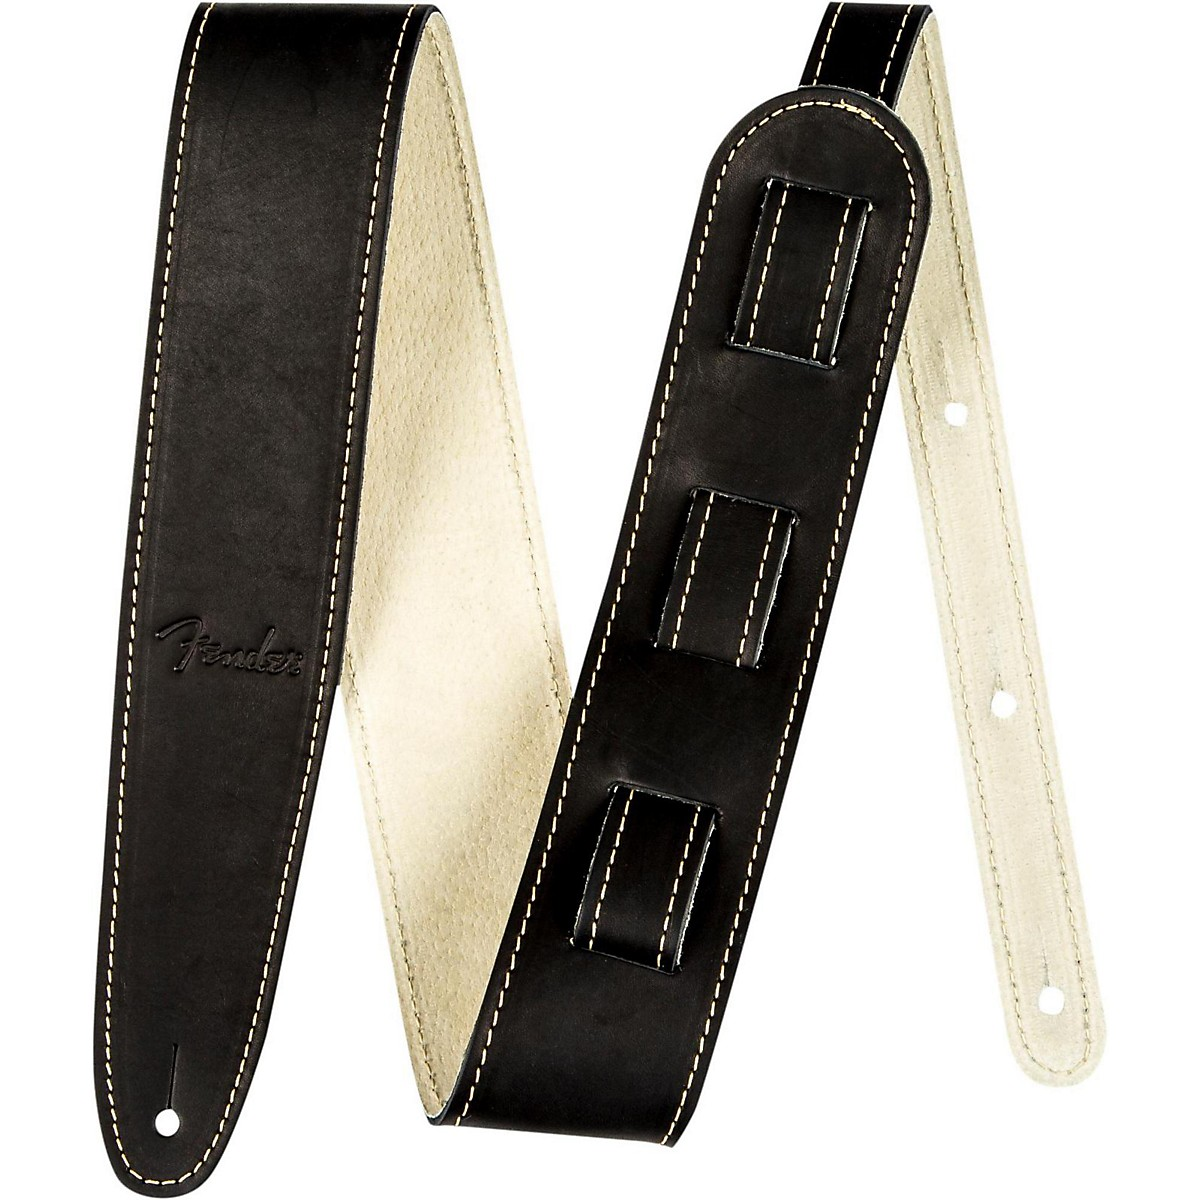 Fender Ball Glove Leather Guitar Strap